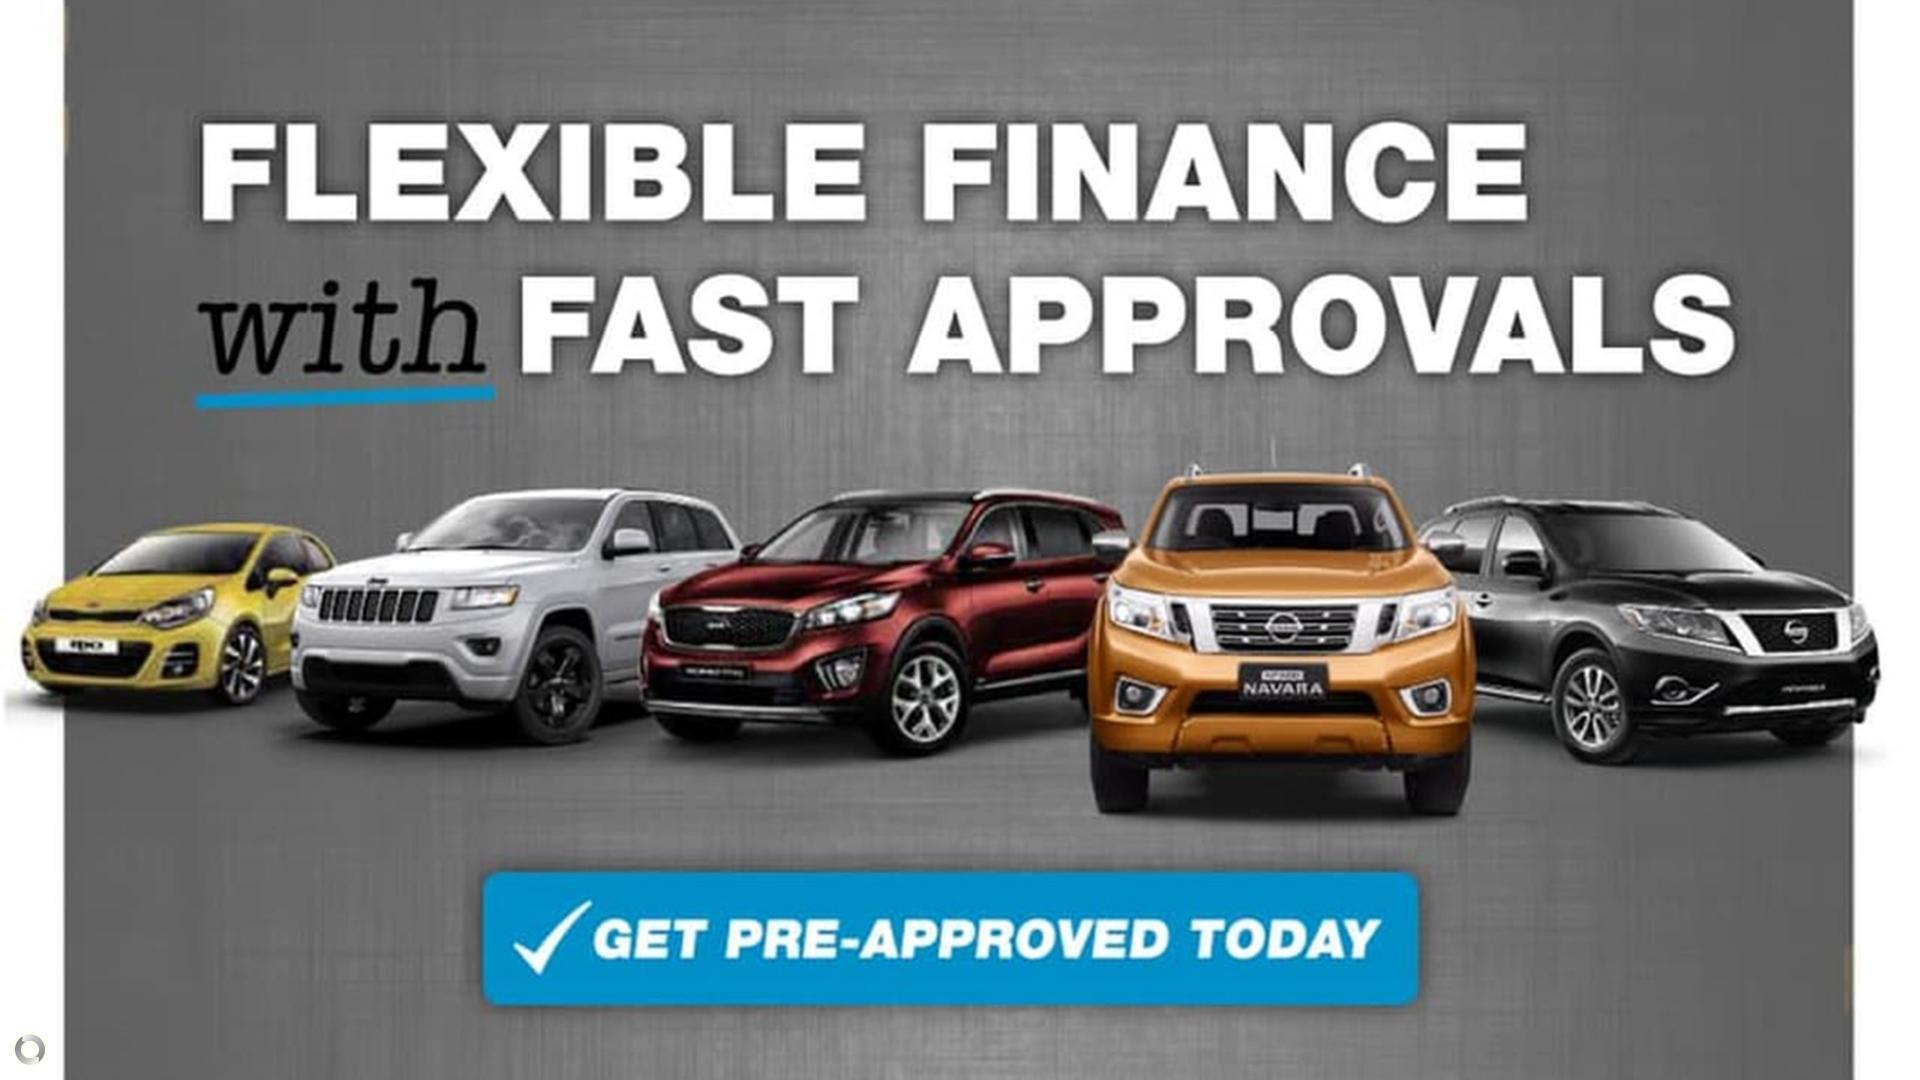 2013 Holden Special Vehicles Gts  GEN-F